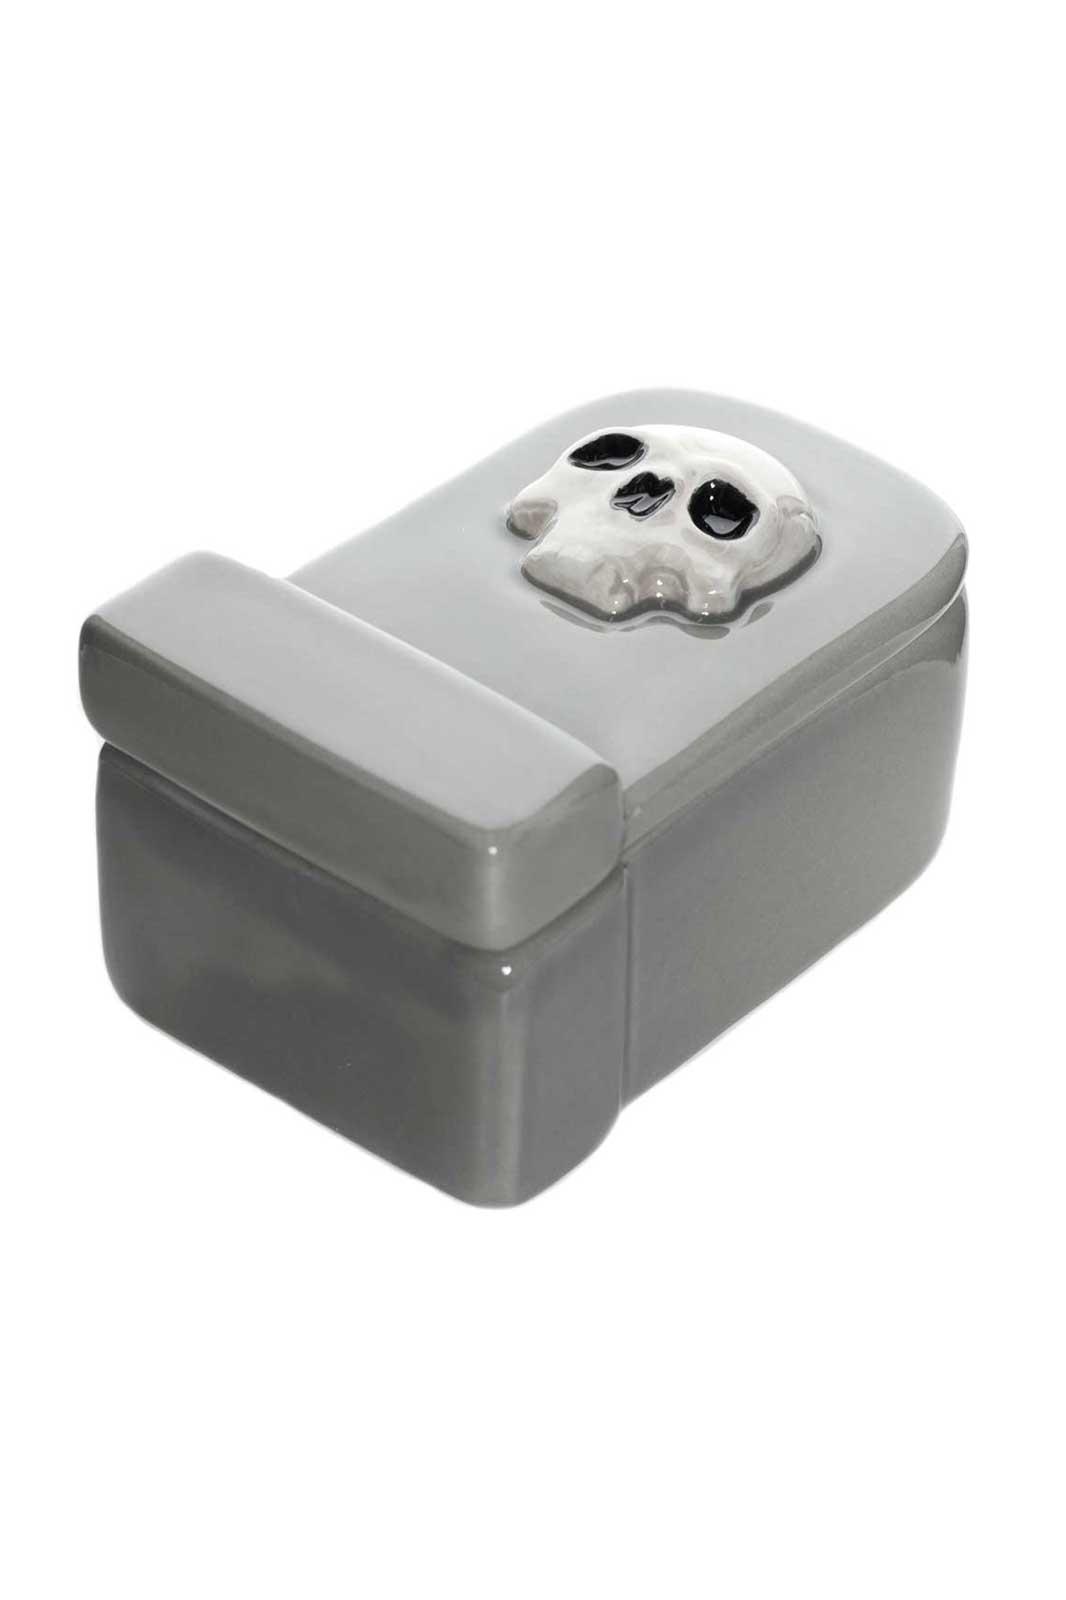 Tombstone Jewelry Box Side